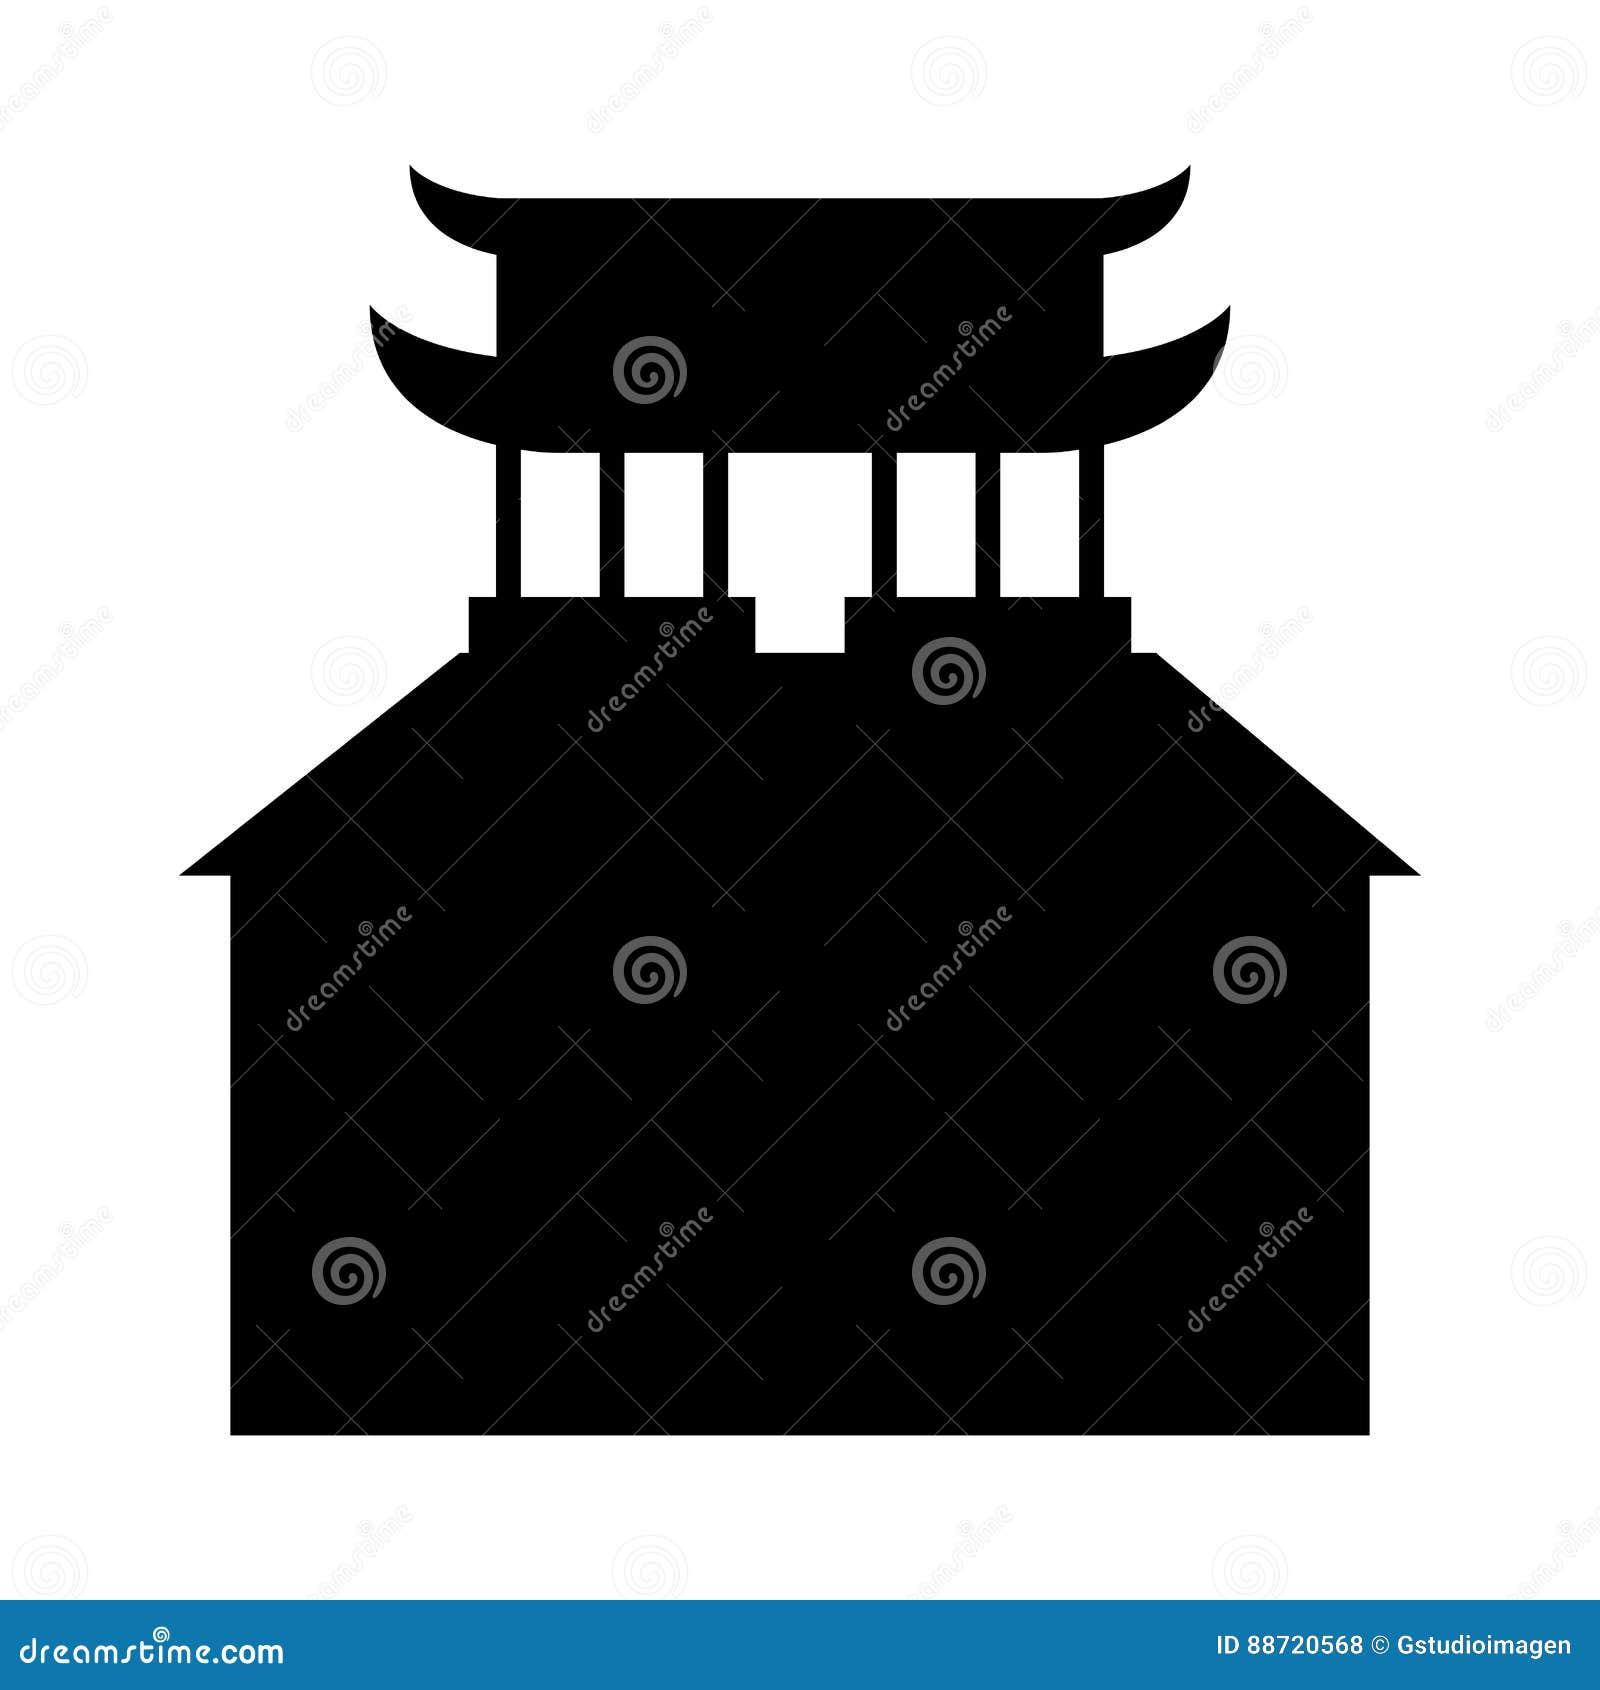 asian building castle icon stock vector - image: 88720568